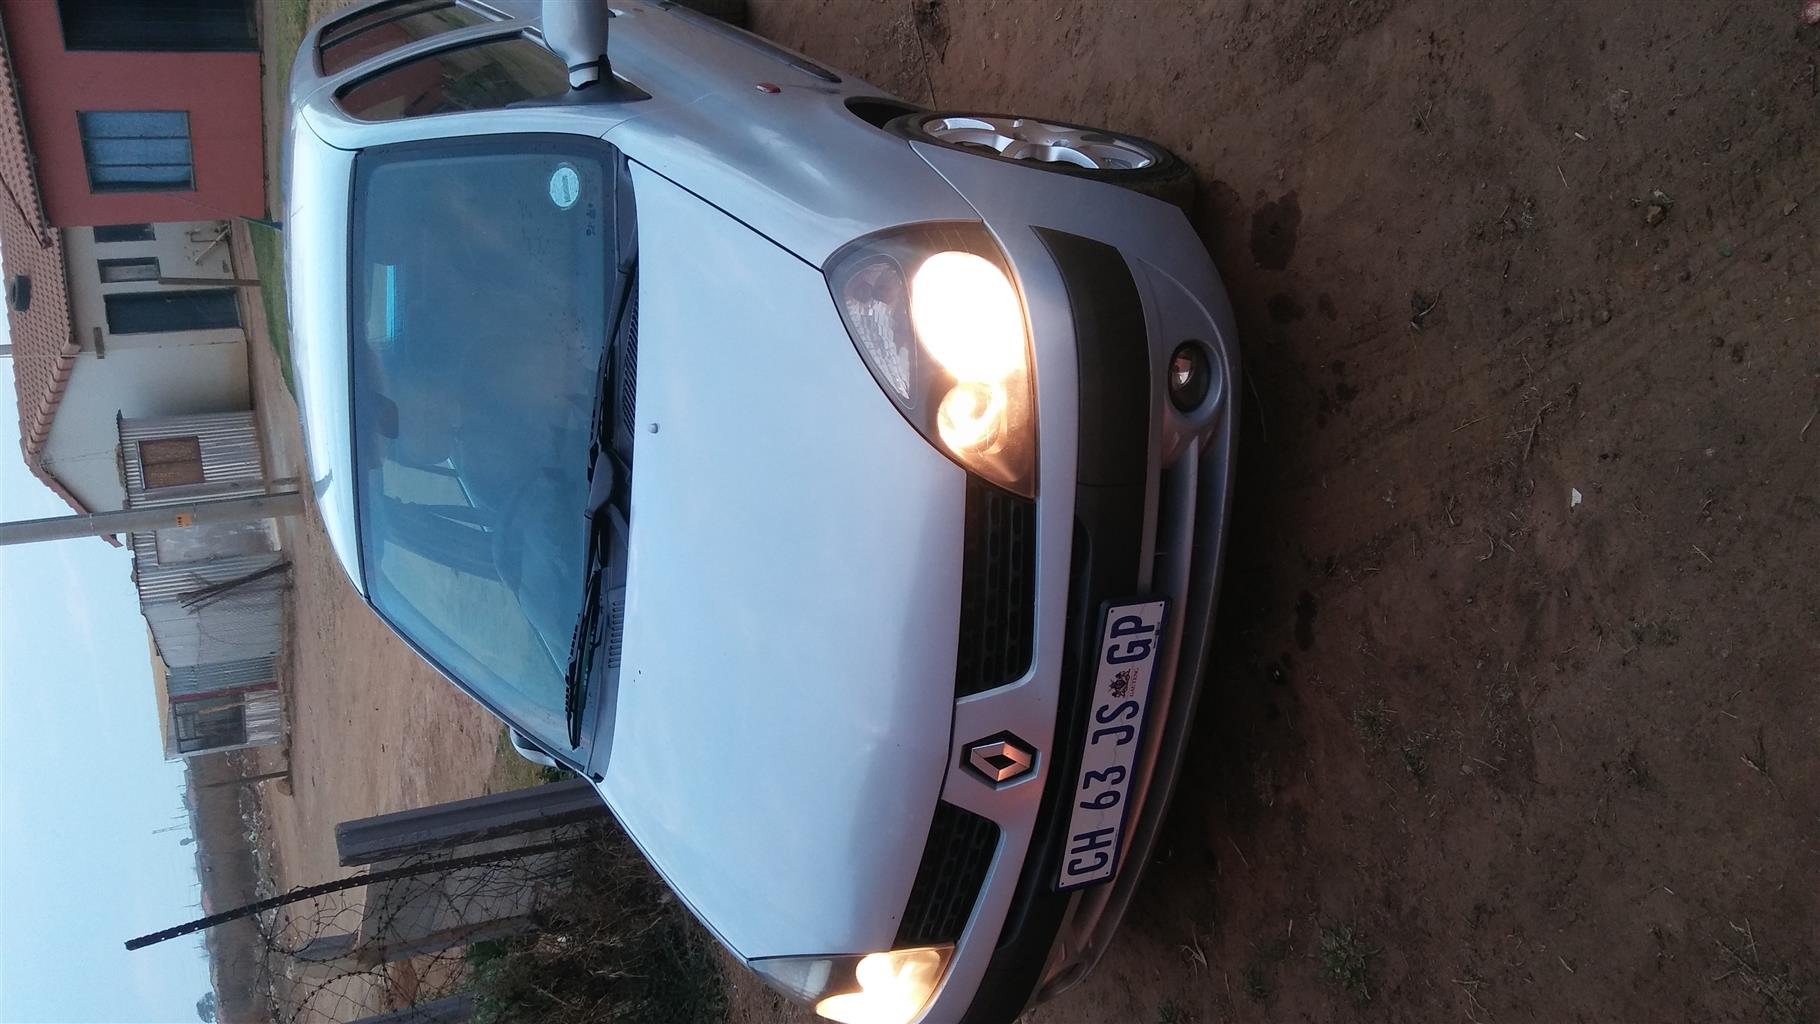 2002 Renault Clio 1.6 Expression 5 door